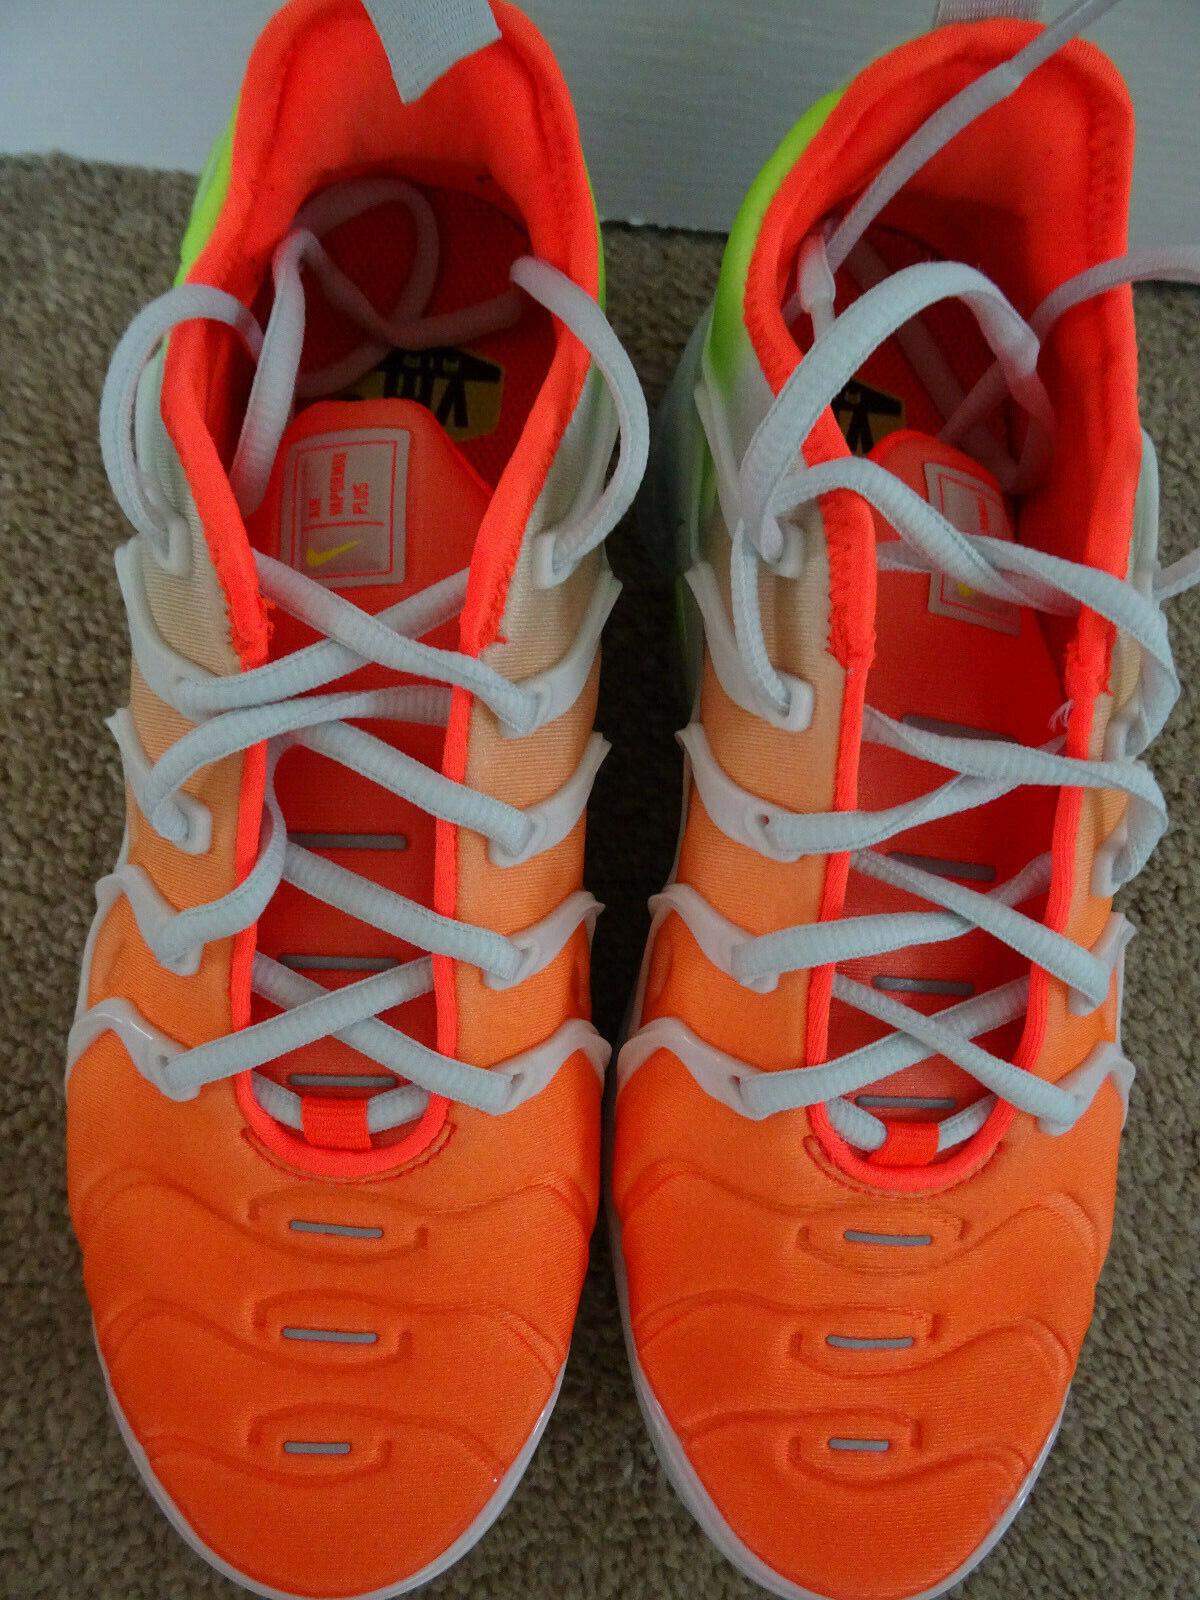 Plus Chaussures Vapormax Baskets Wmns Nike Air ZuOPwiTkX